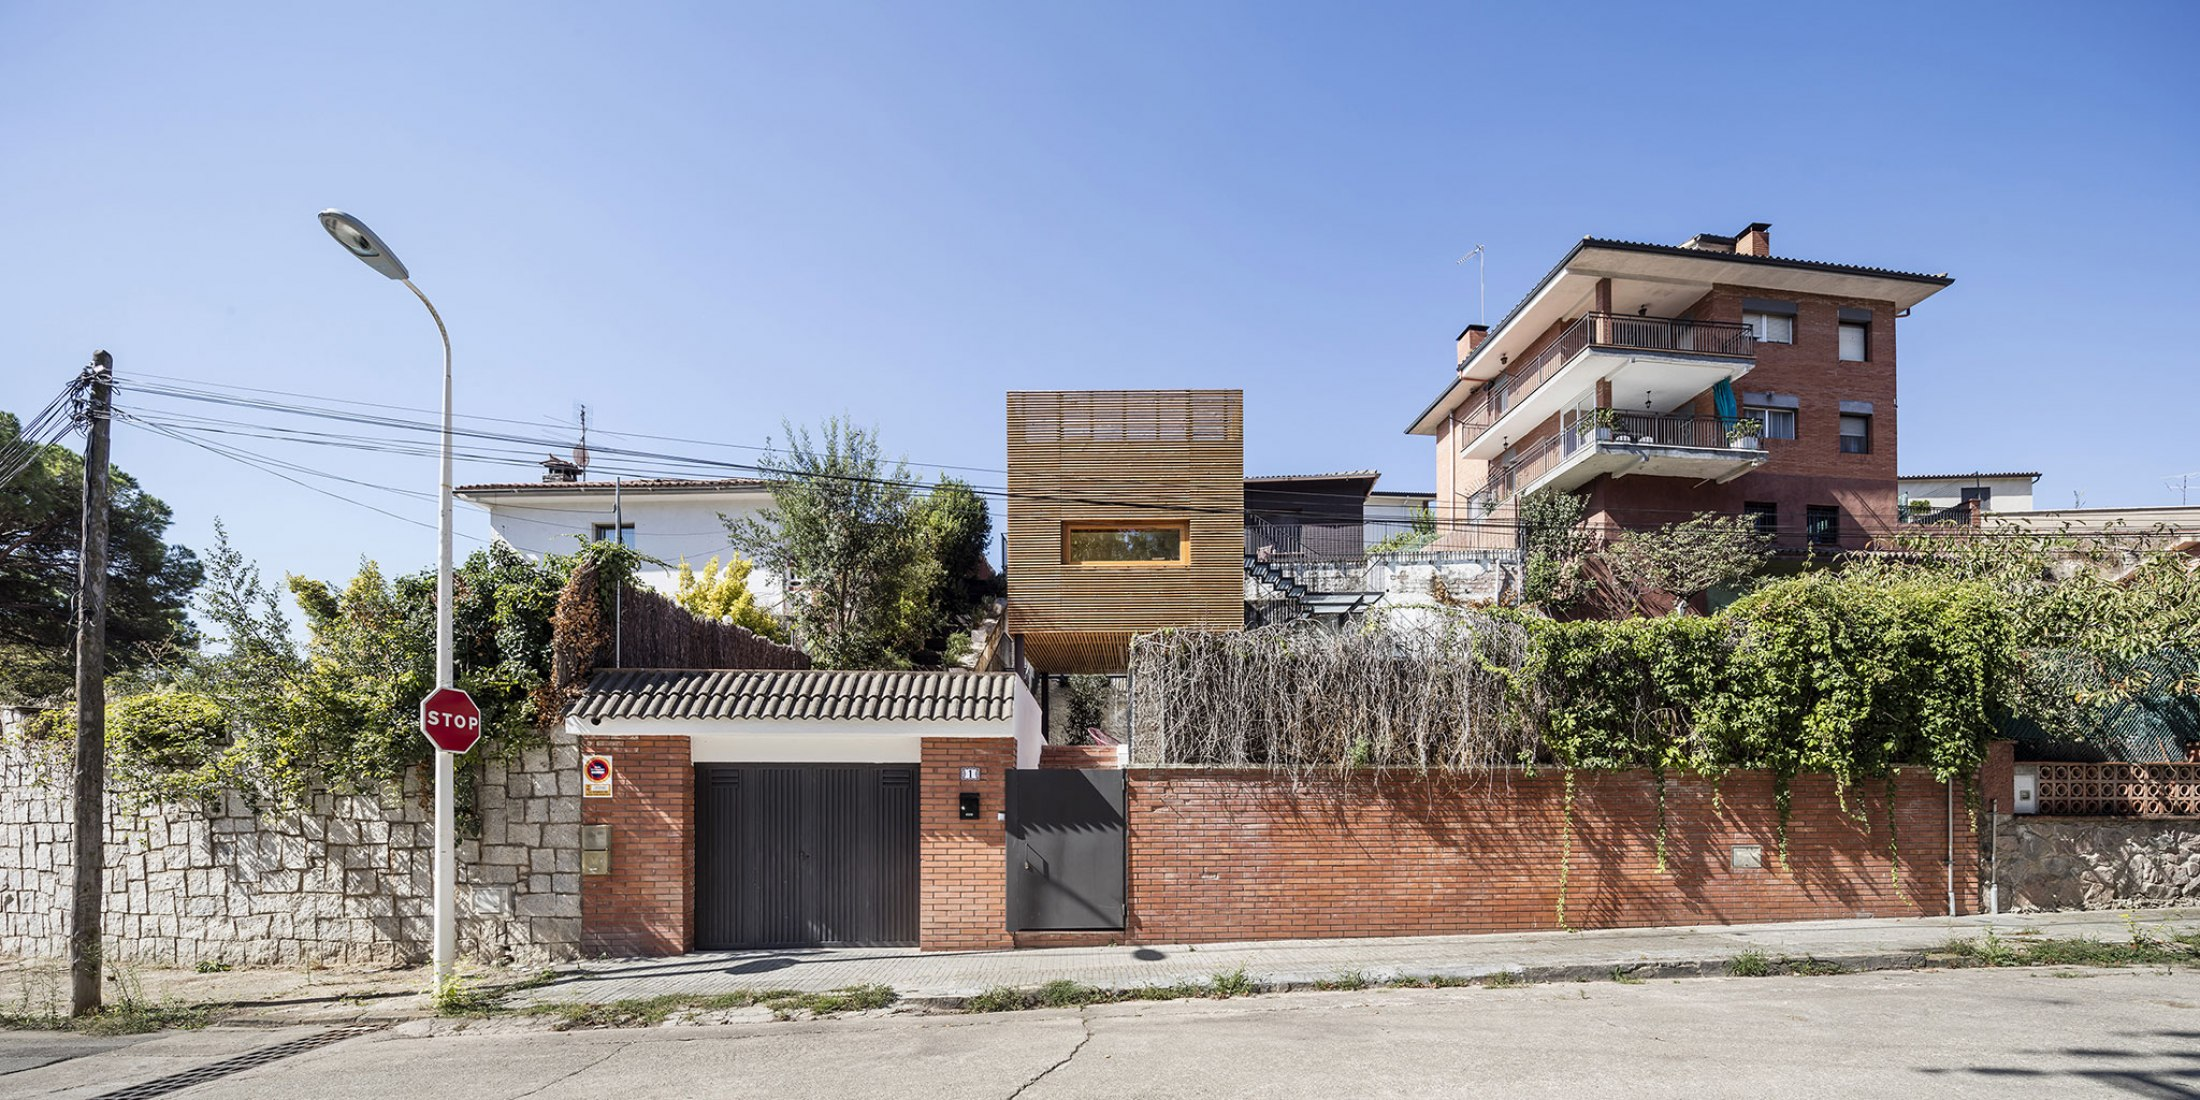 Casa JC por Alventosa Morell Arquitectes. Fotografía © Adrià Golua